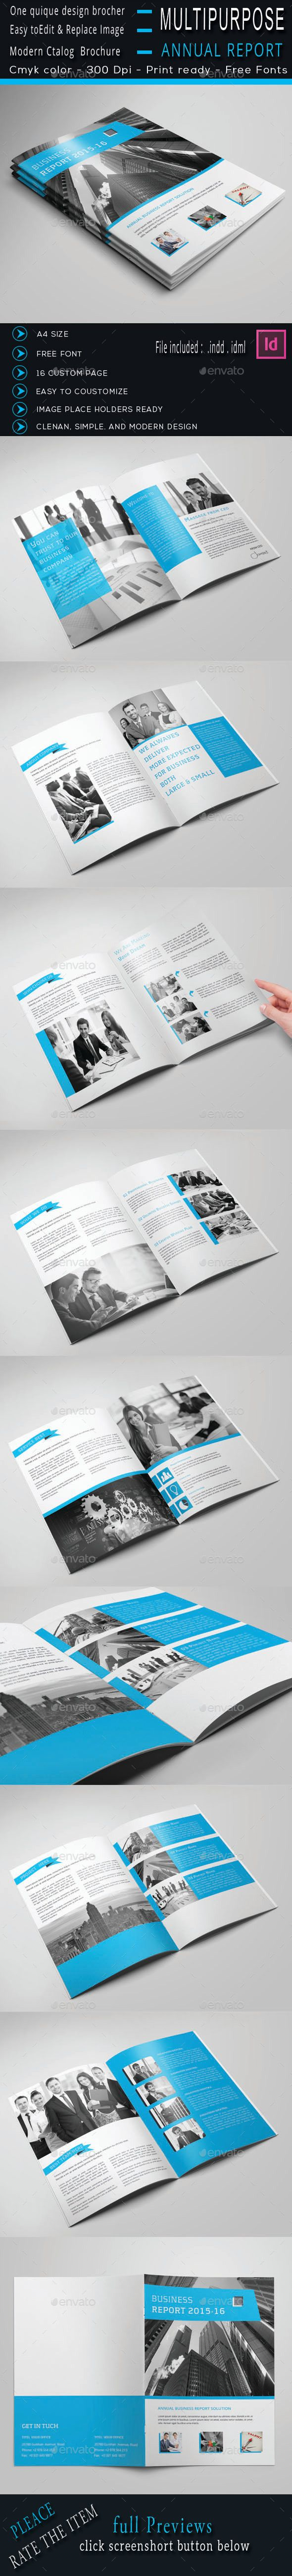 Annual Report / Corporate Brochure